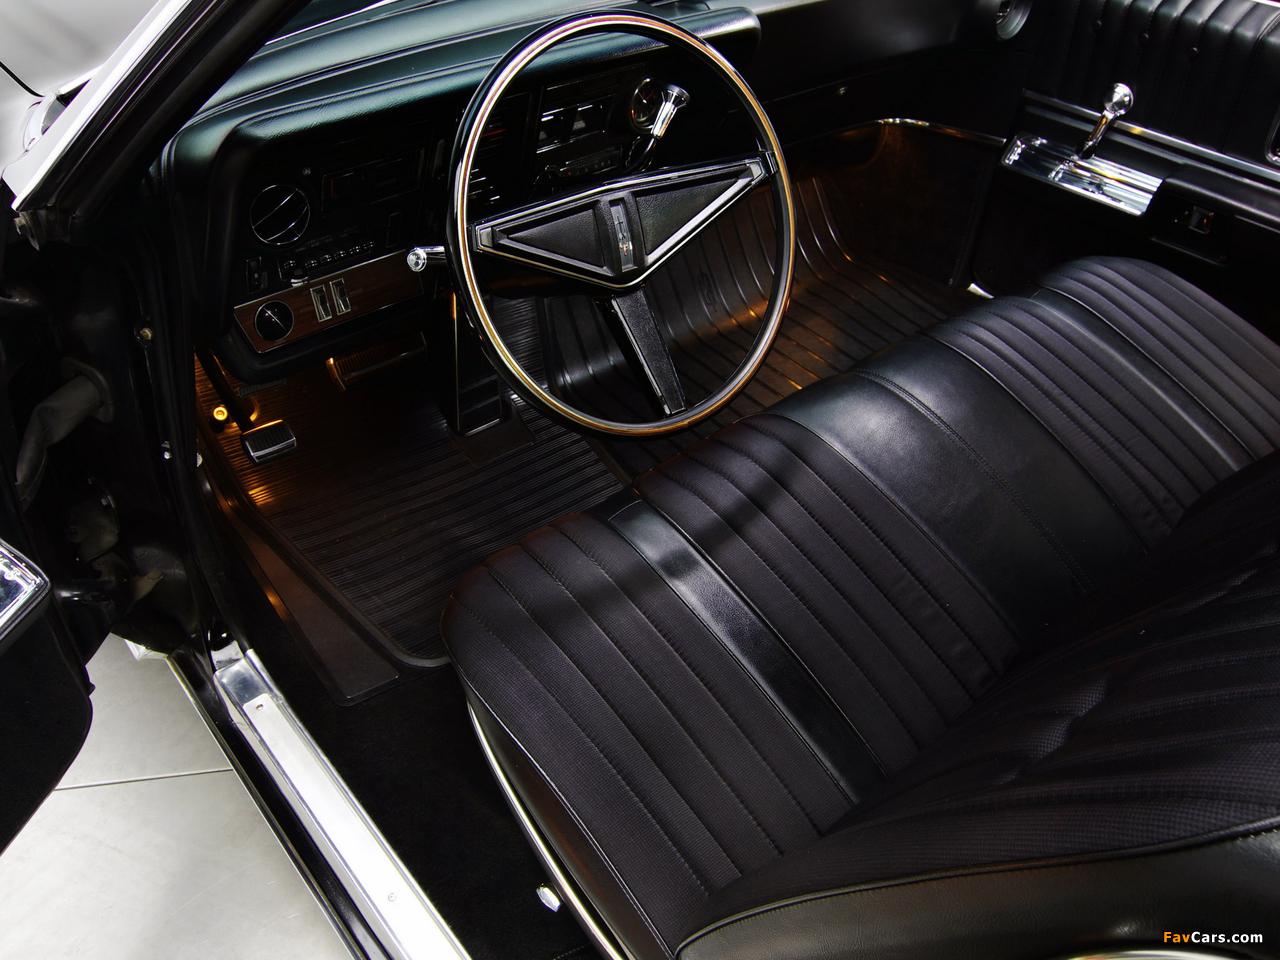 Oldsmobile Toronado (9487) 1968 photos (1280 x 960)